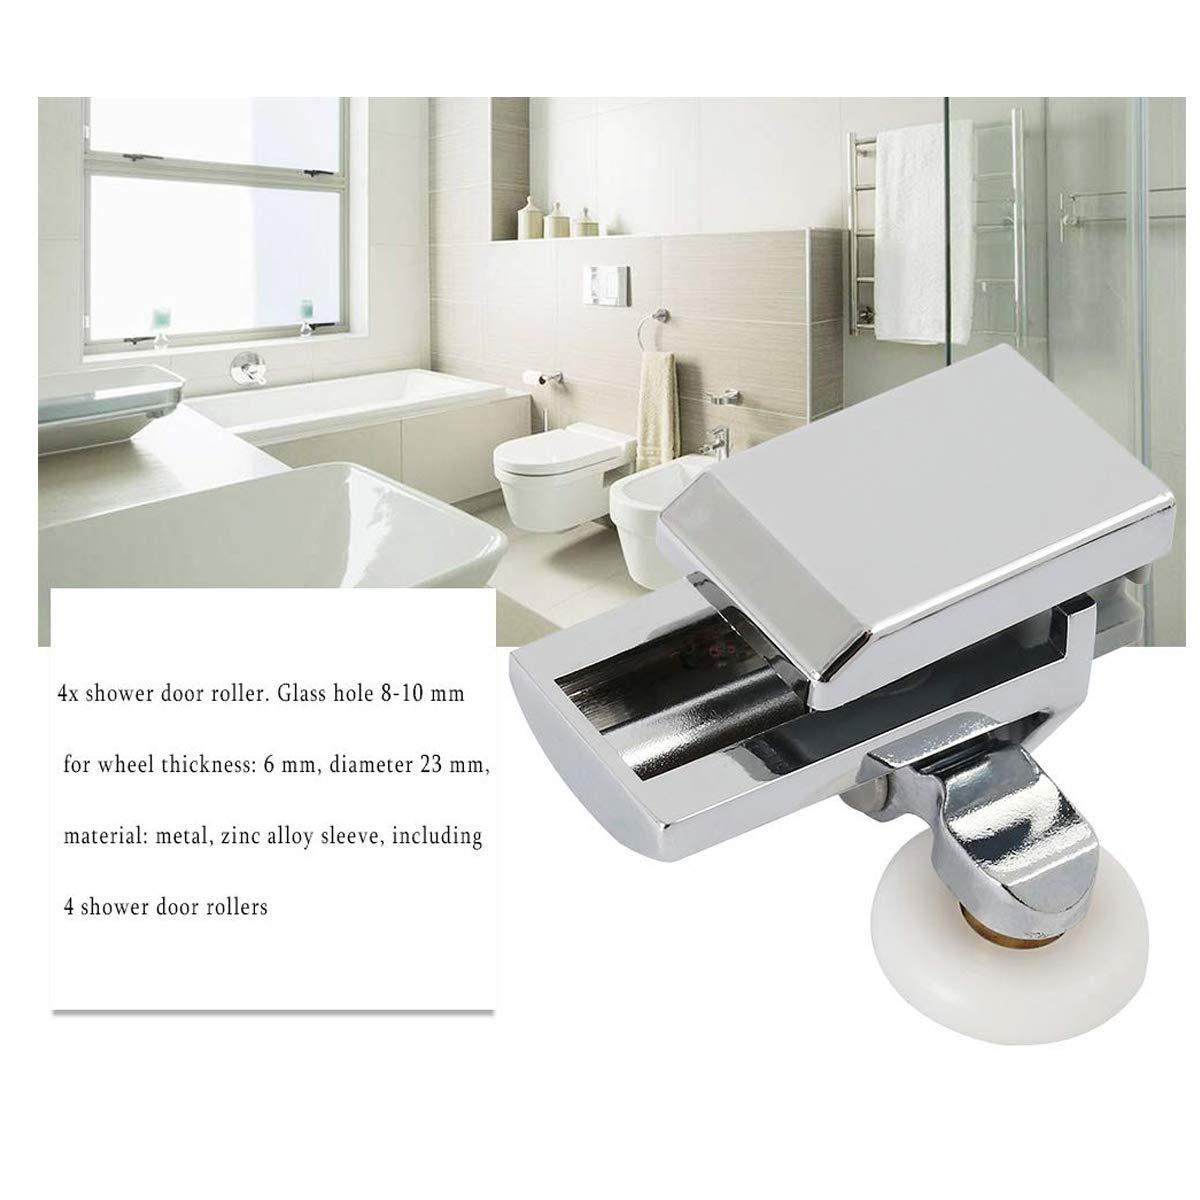 SET OF 4 SLIDING SHOWER DOOR BATHROOM ROLLERS//RUNNERS//WHEELS 23MM DIAMETER